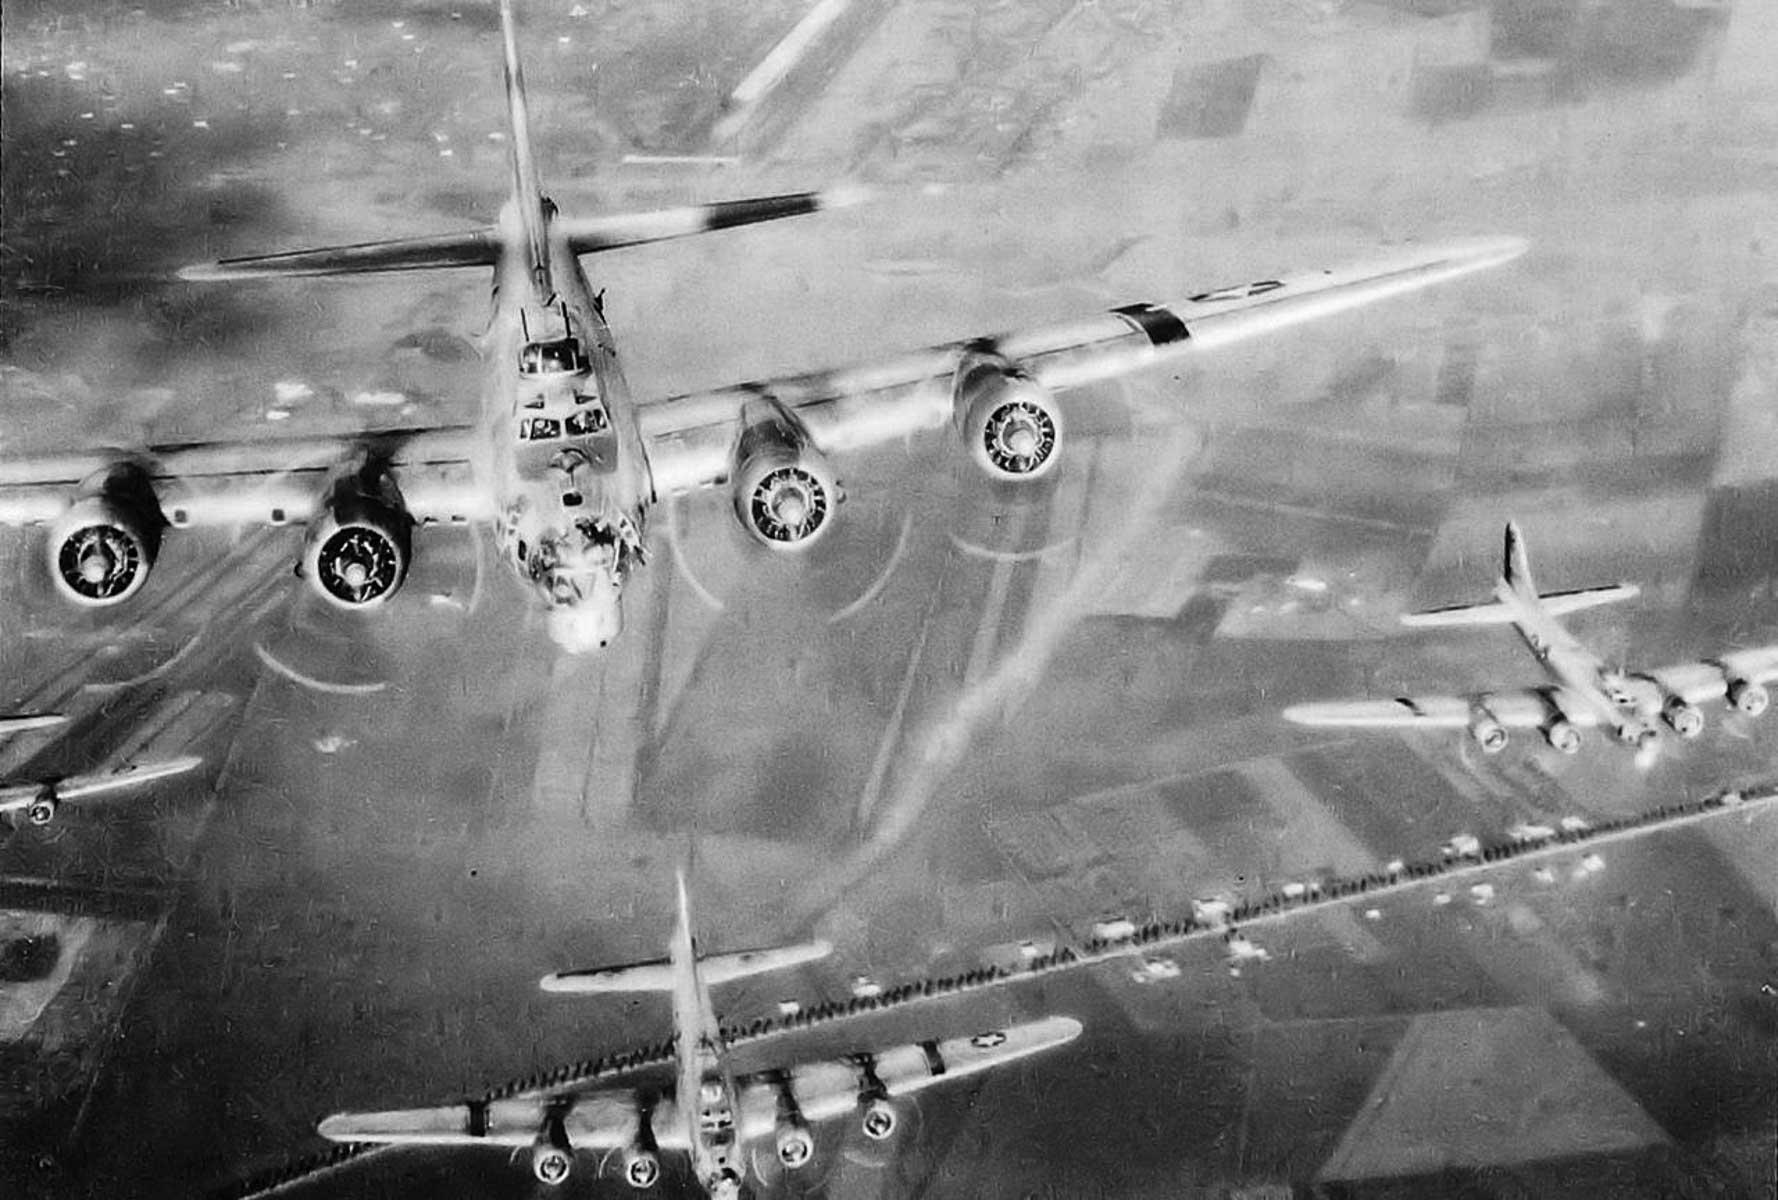 B-17s Amendola Takeoff 1944